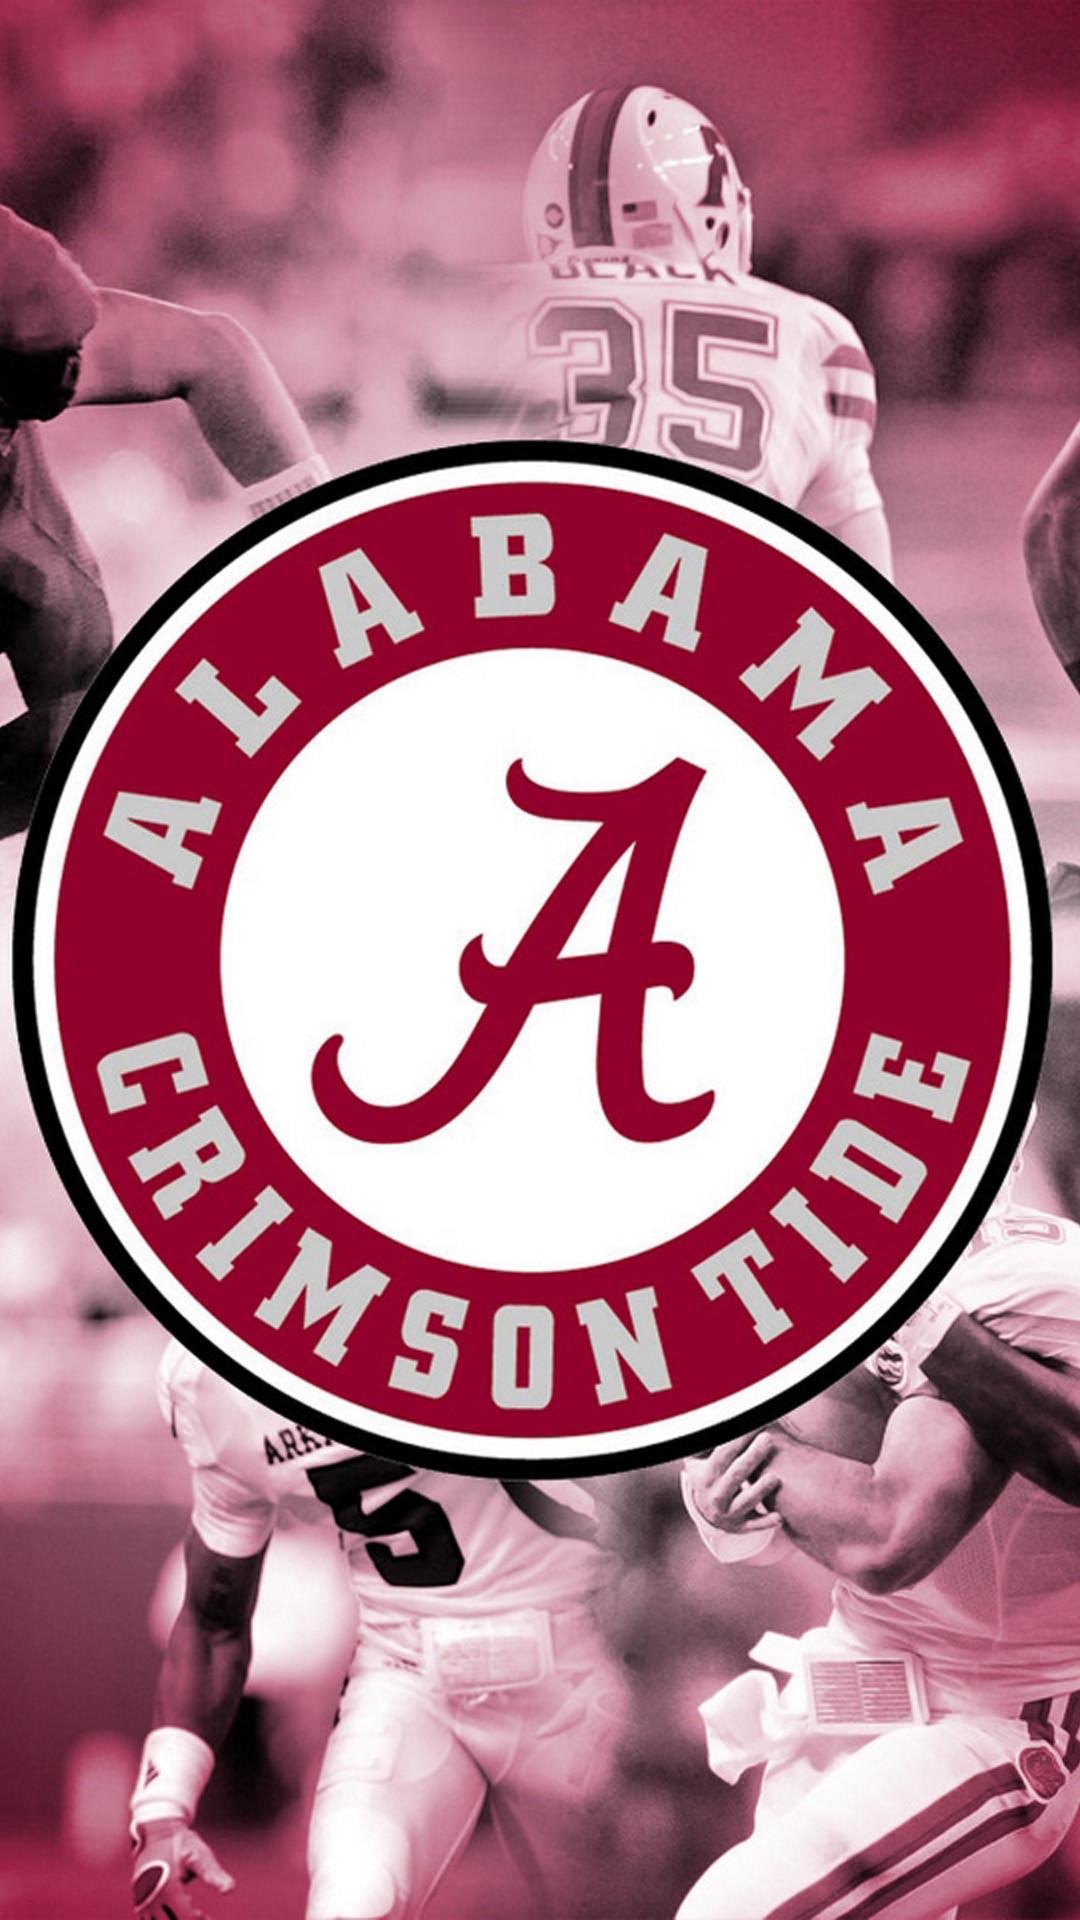 Alabama football screensavers and wallpaper 68 images - Free alabama crimson tide wallpaper for android ...